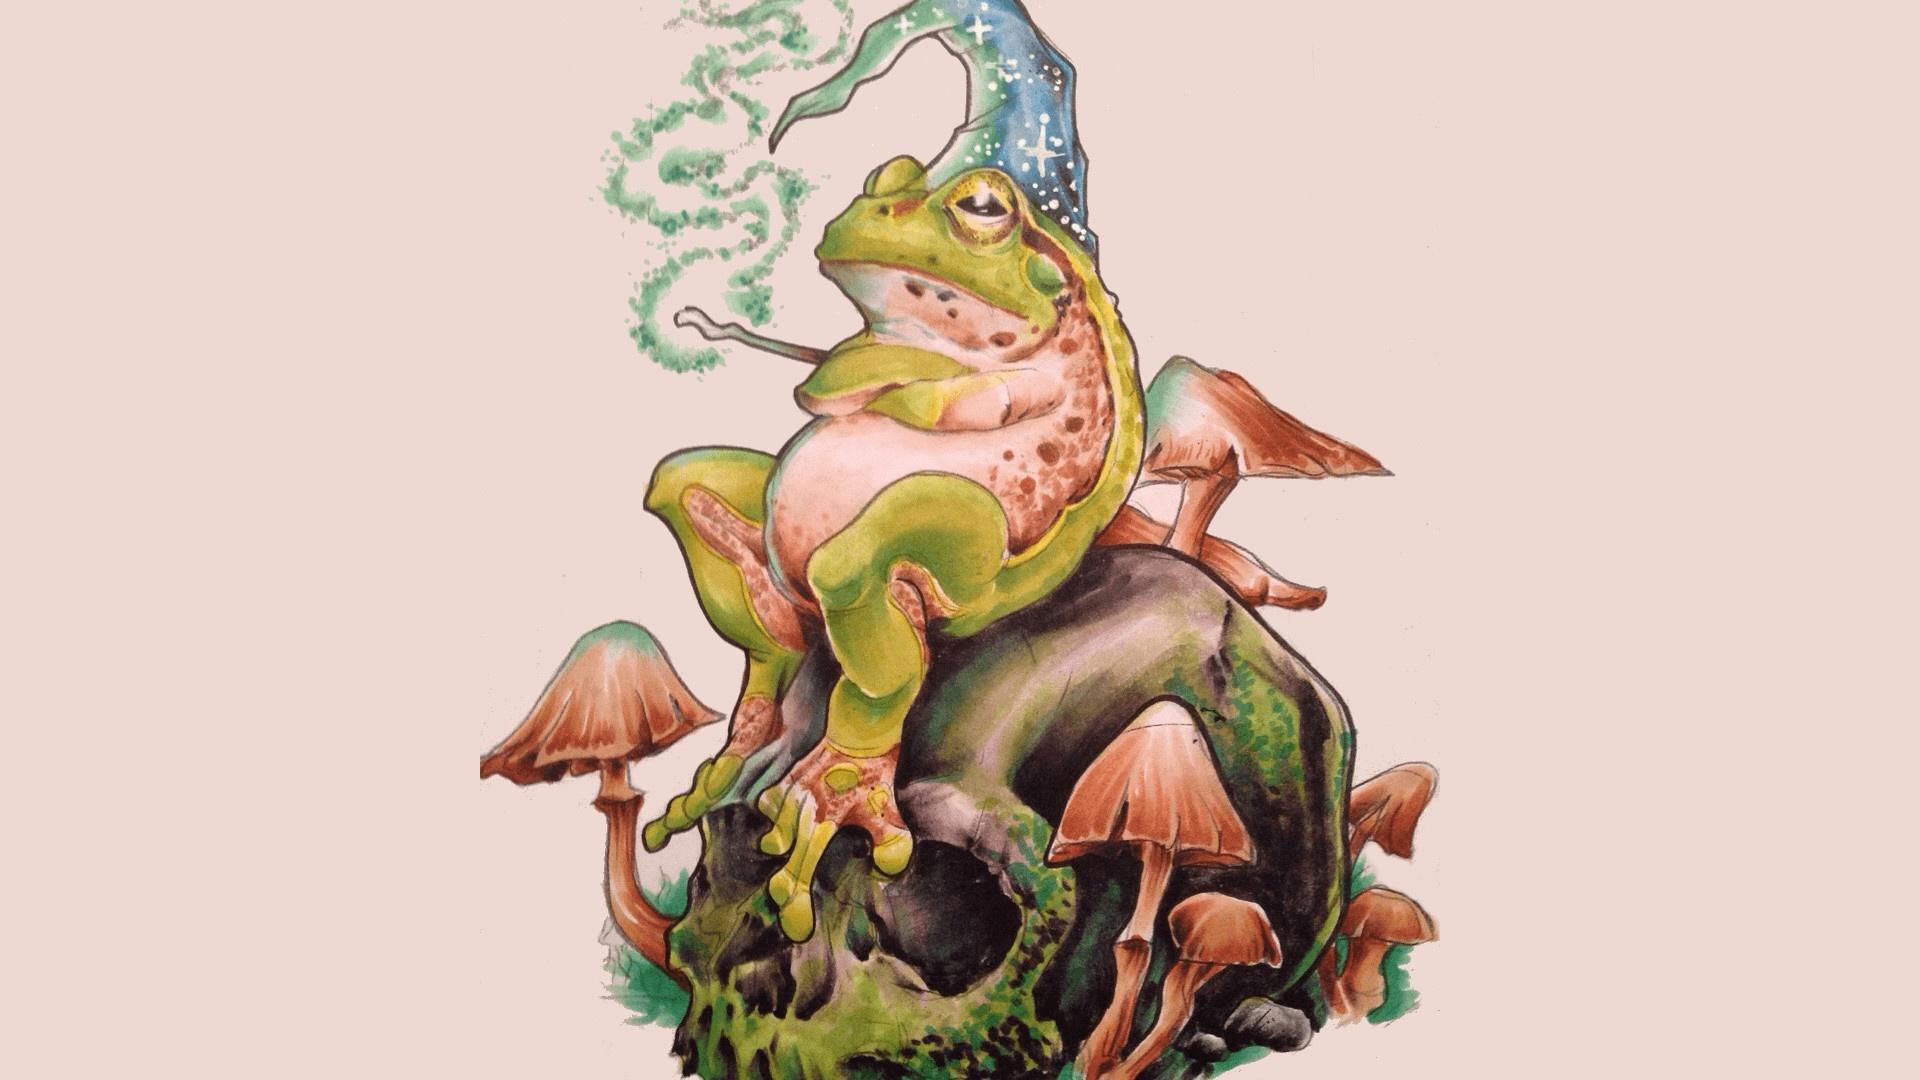 Cartoon Frog pc wallpaper